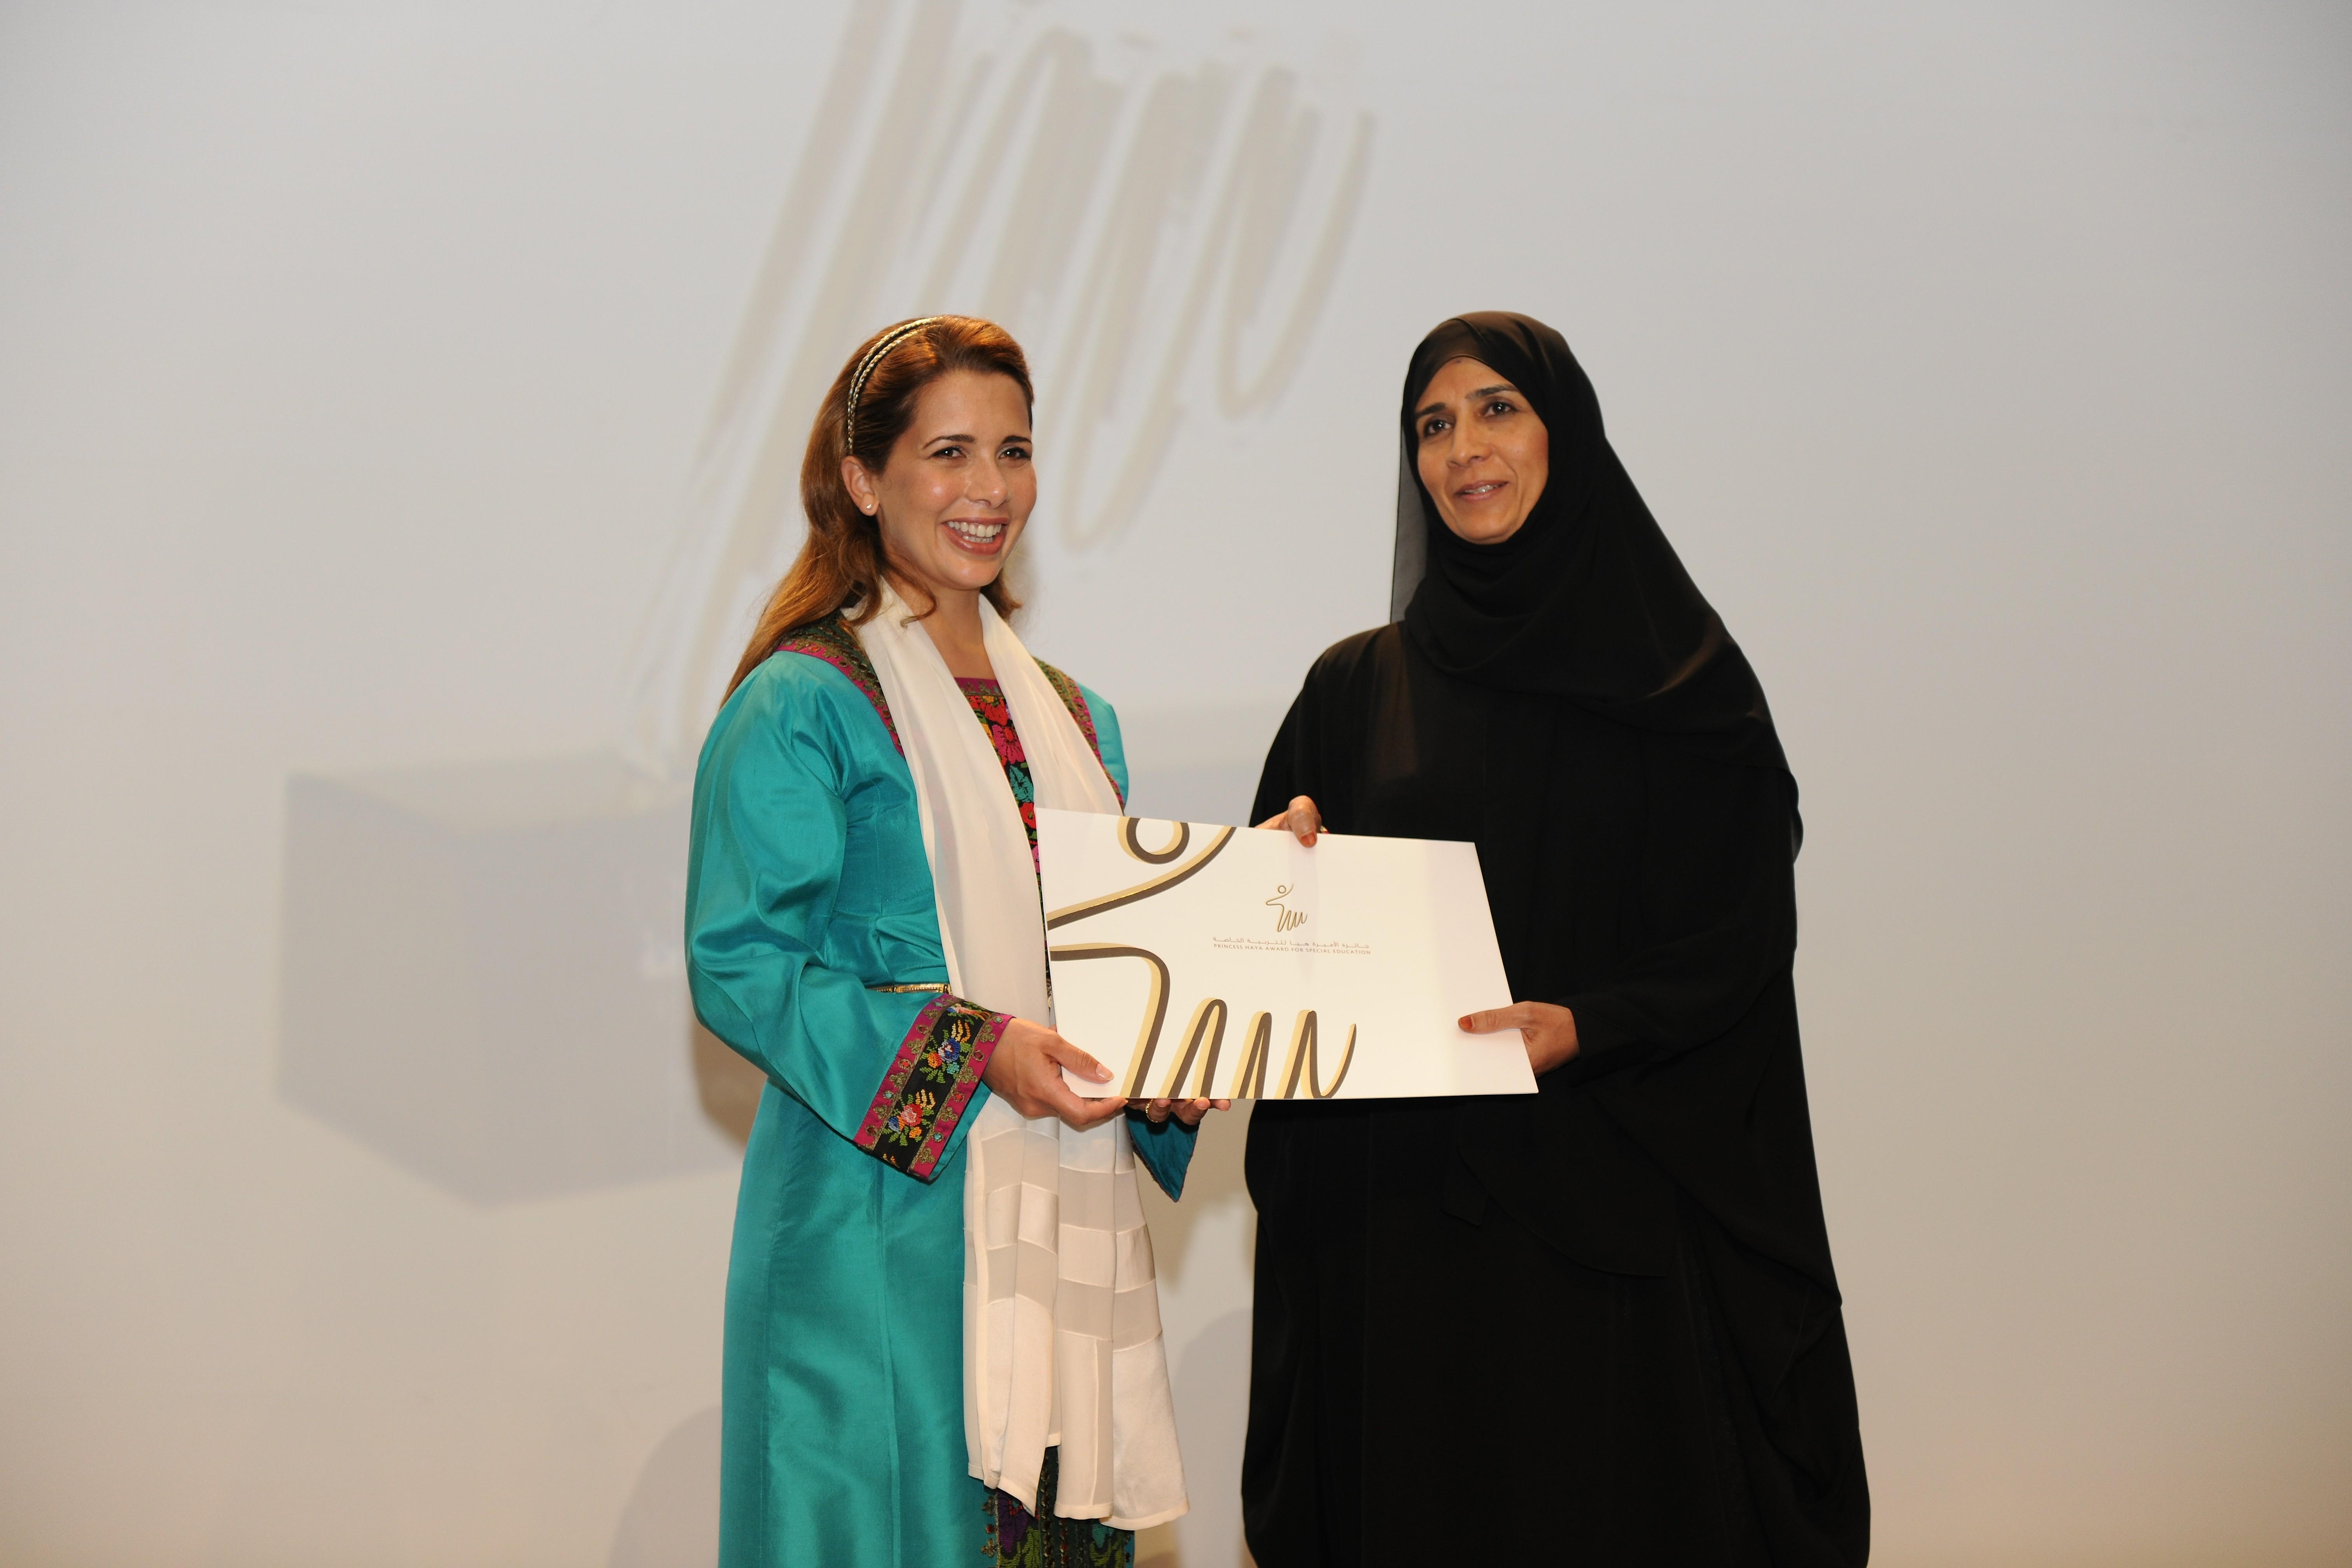 Princess Haya Award for Special Education | LinkedIn